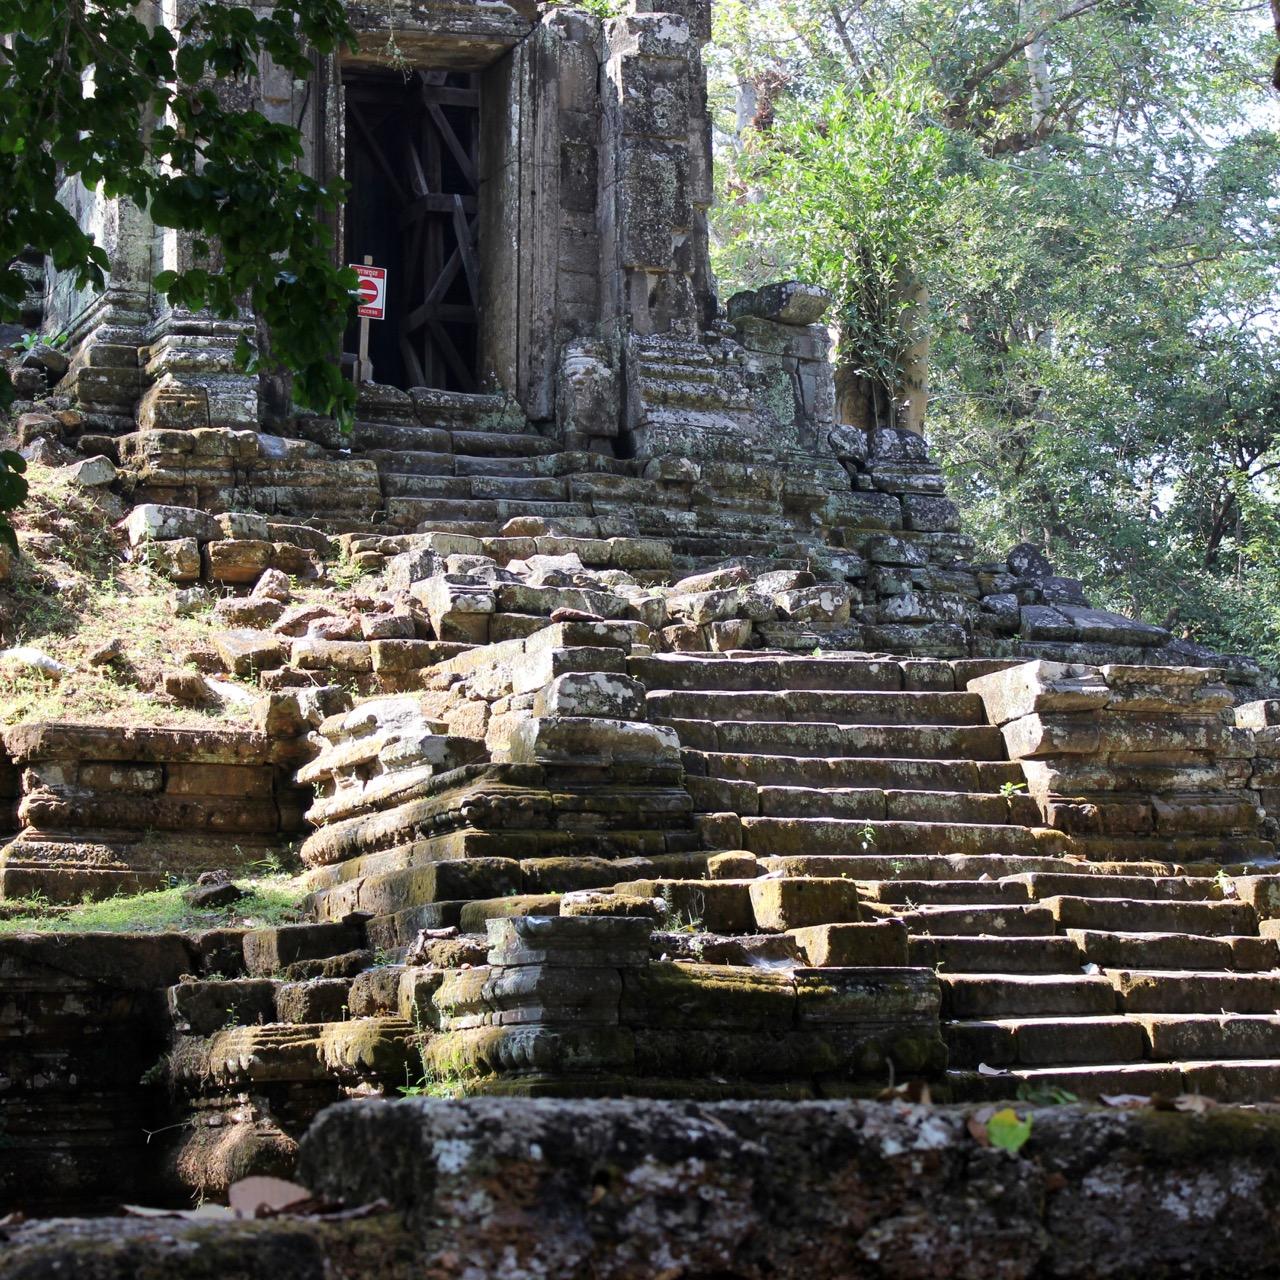 Angkor Wat, Siem Reap, Cambodia - 24